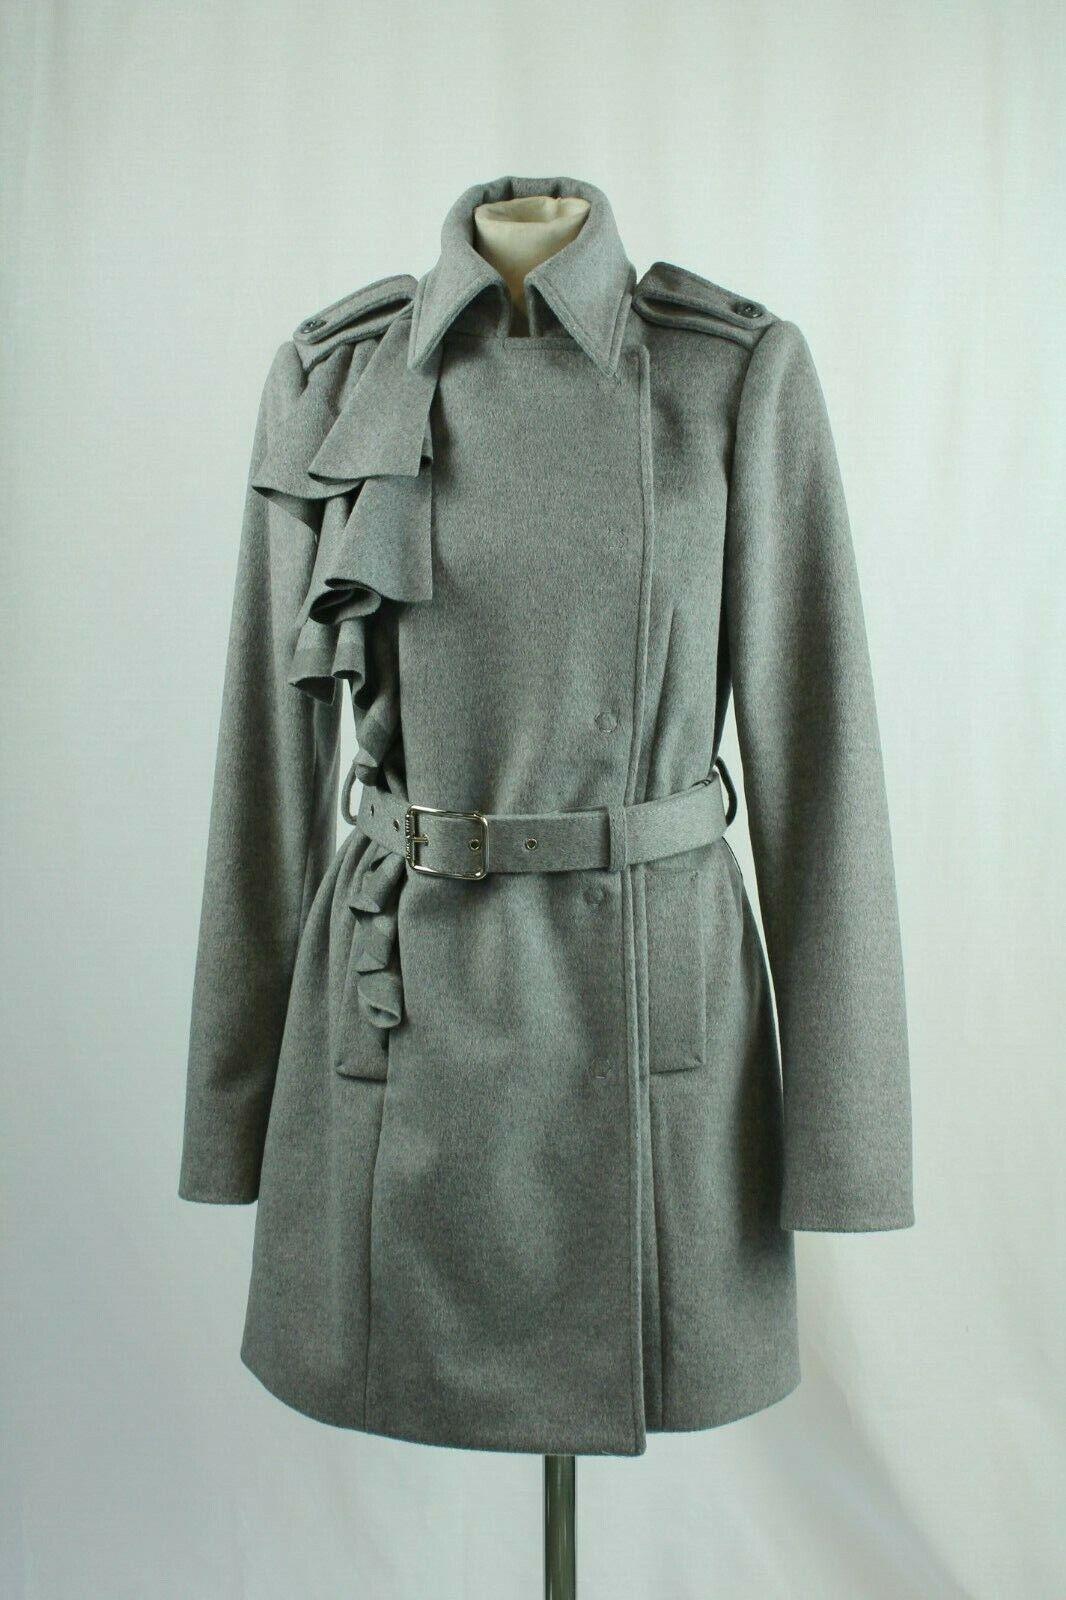 Patrizia Pepe Firenze Grey Cashmere Blend coat, Size UK14 EU42